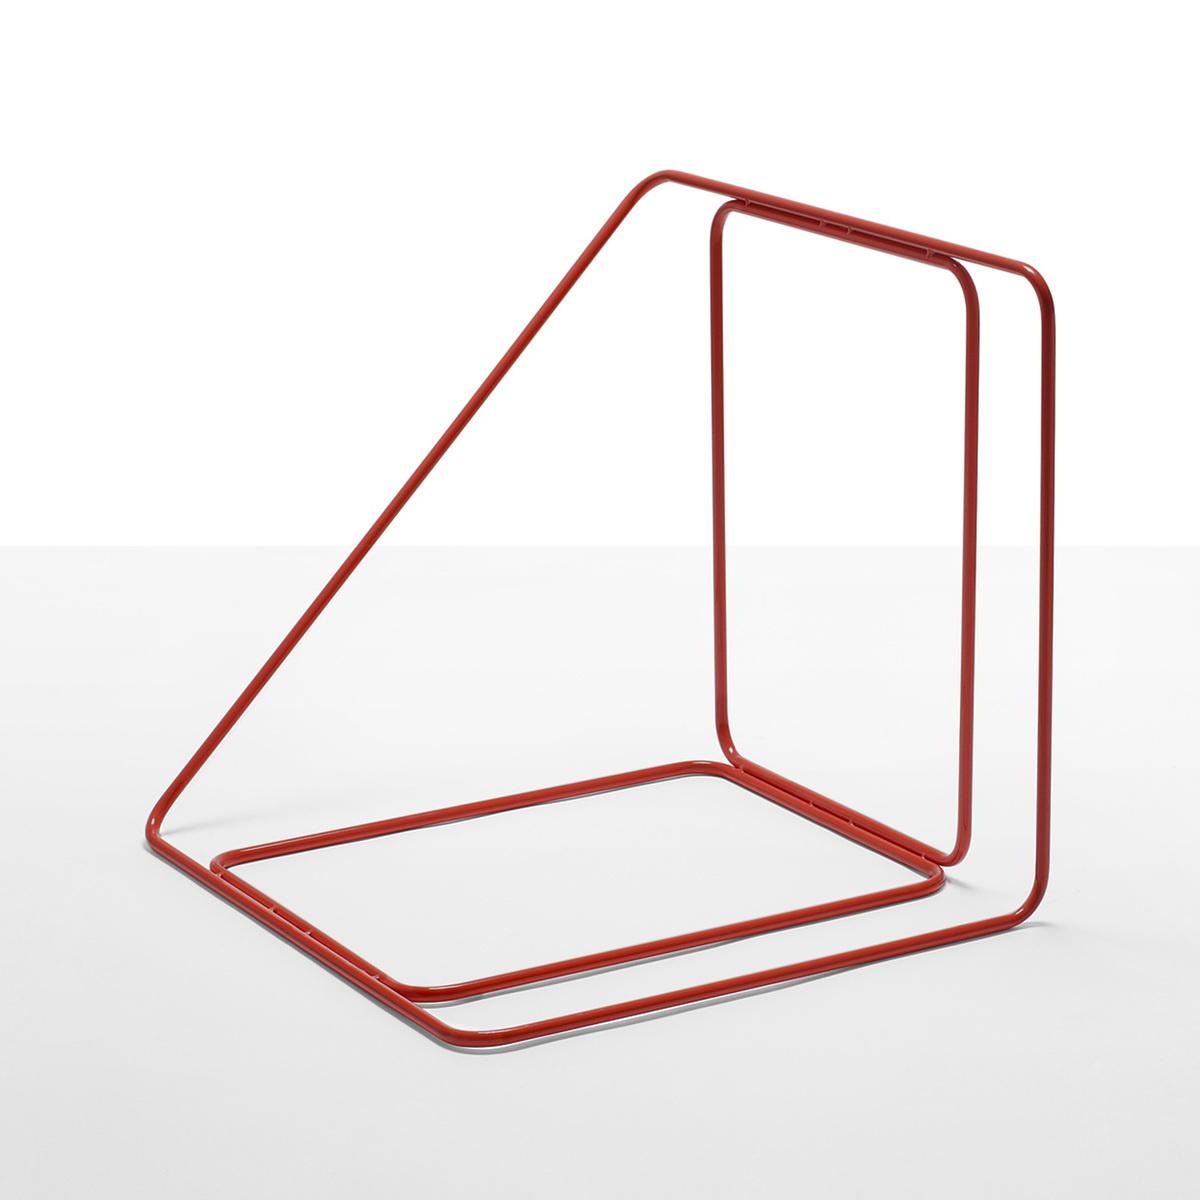 Rodolfo modular frame by thesign lovethesign for Modular a frame